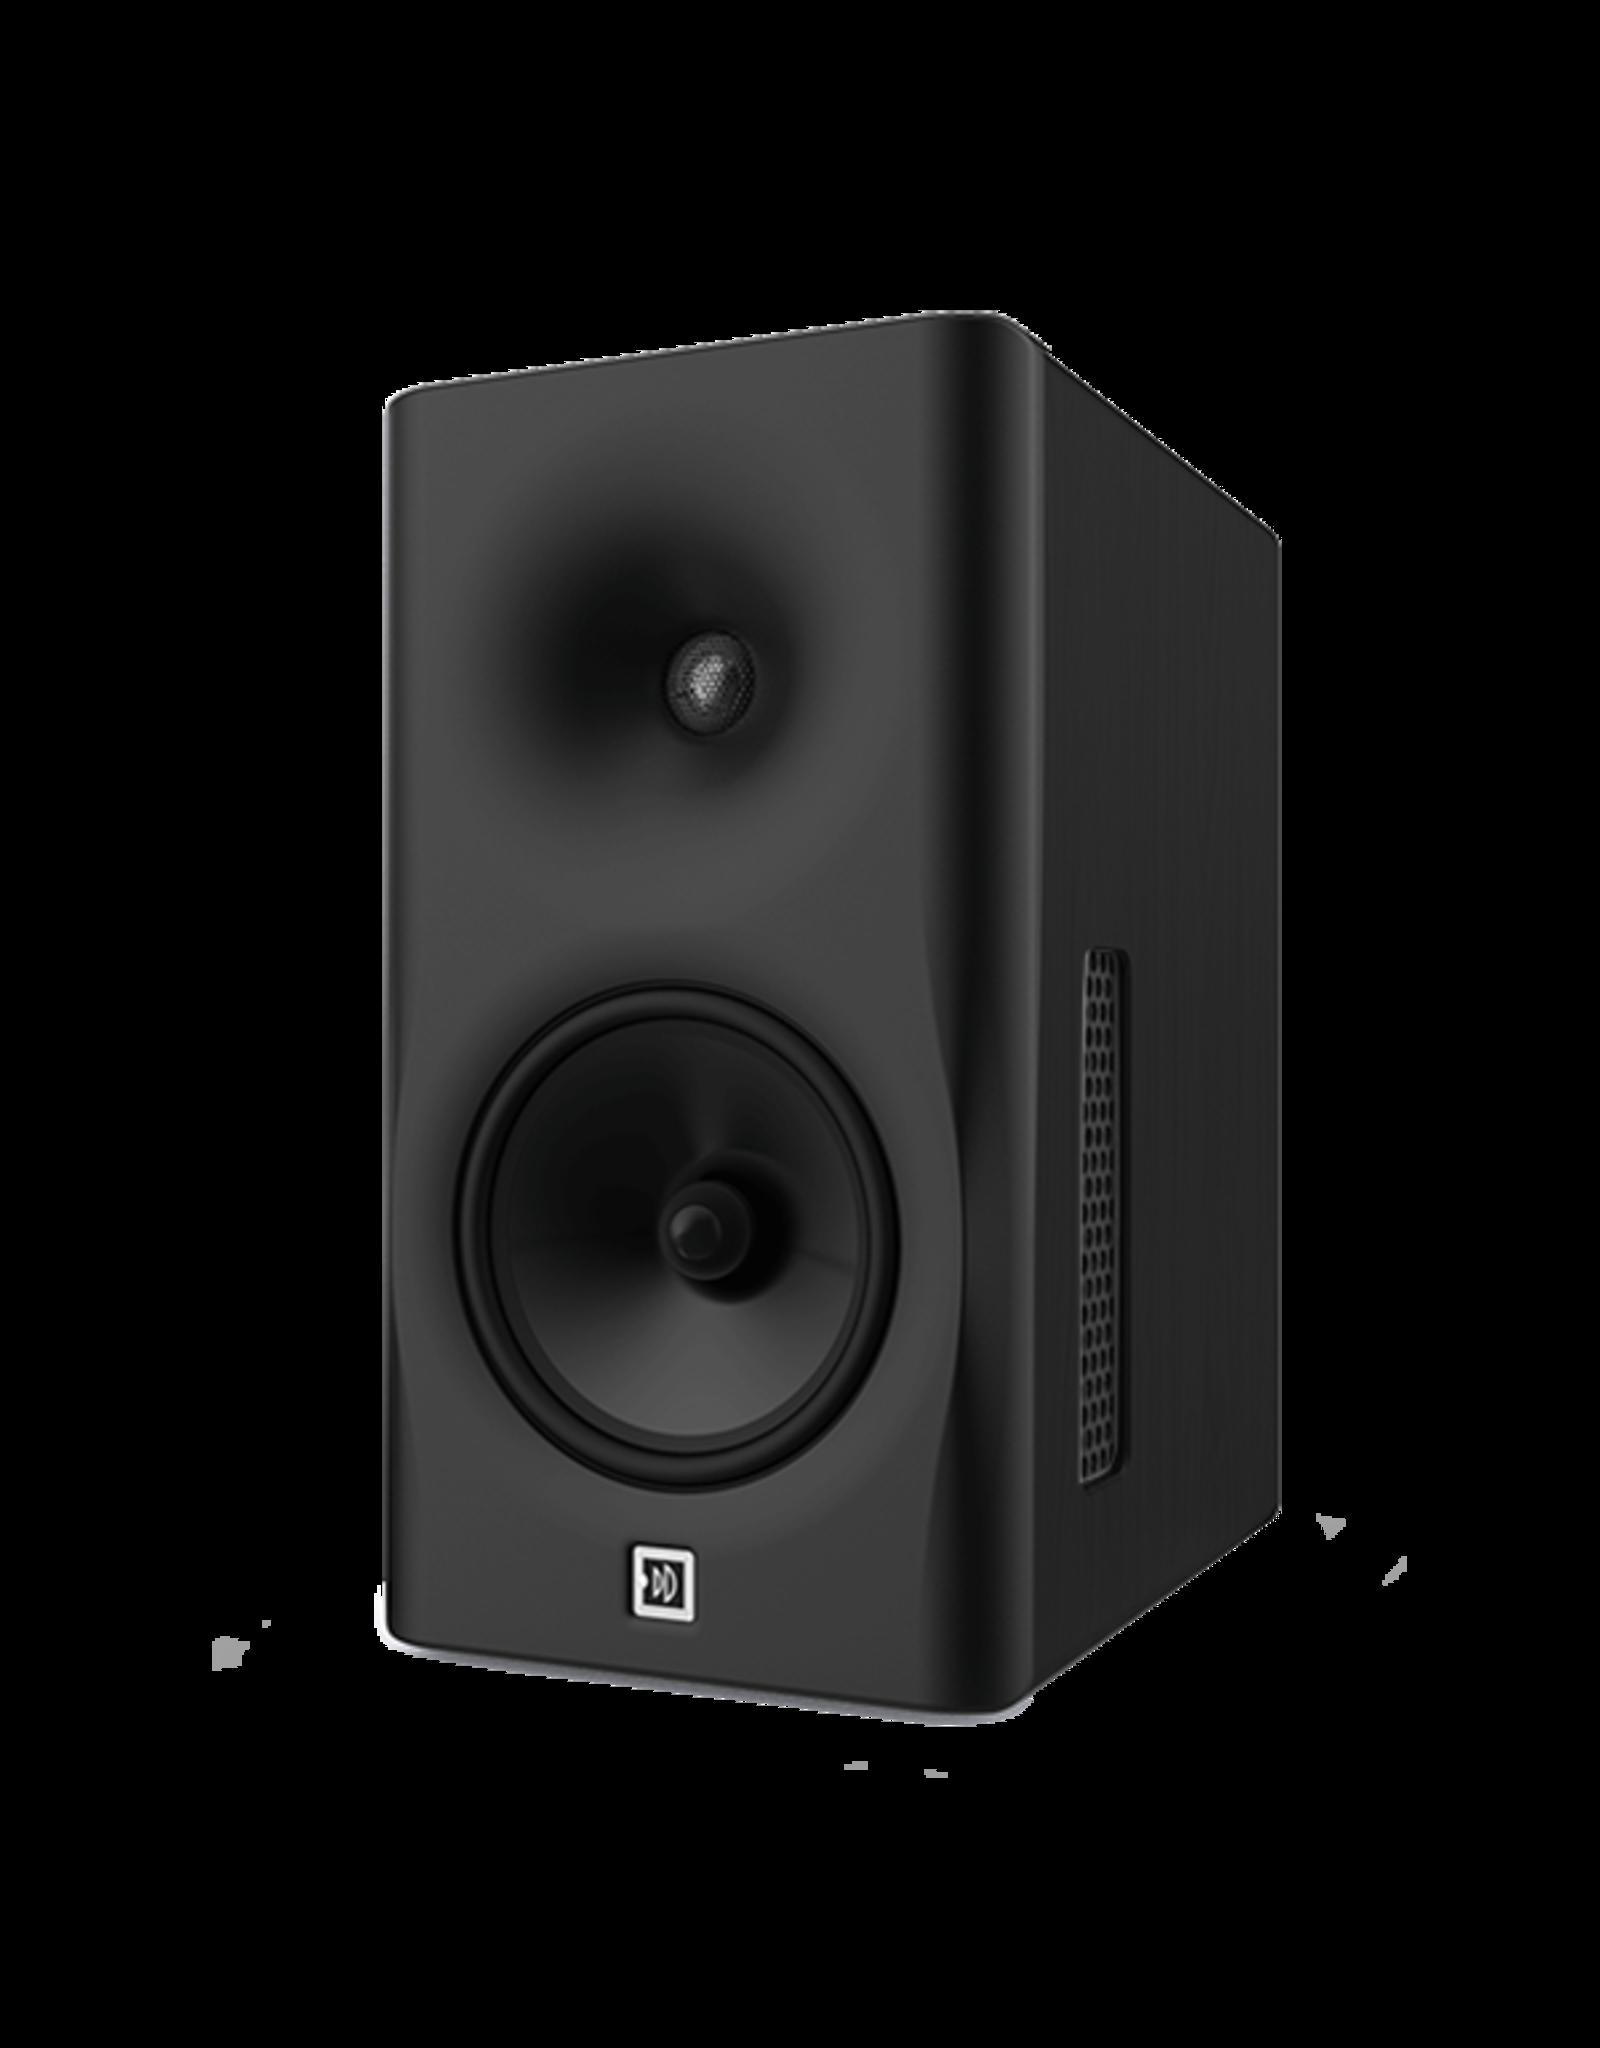 Dutch & Dutch 8C speaker, black baffle, black cabinet